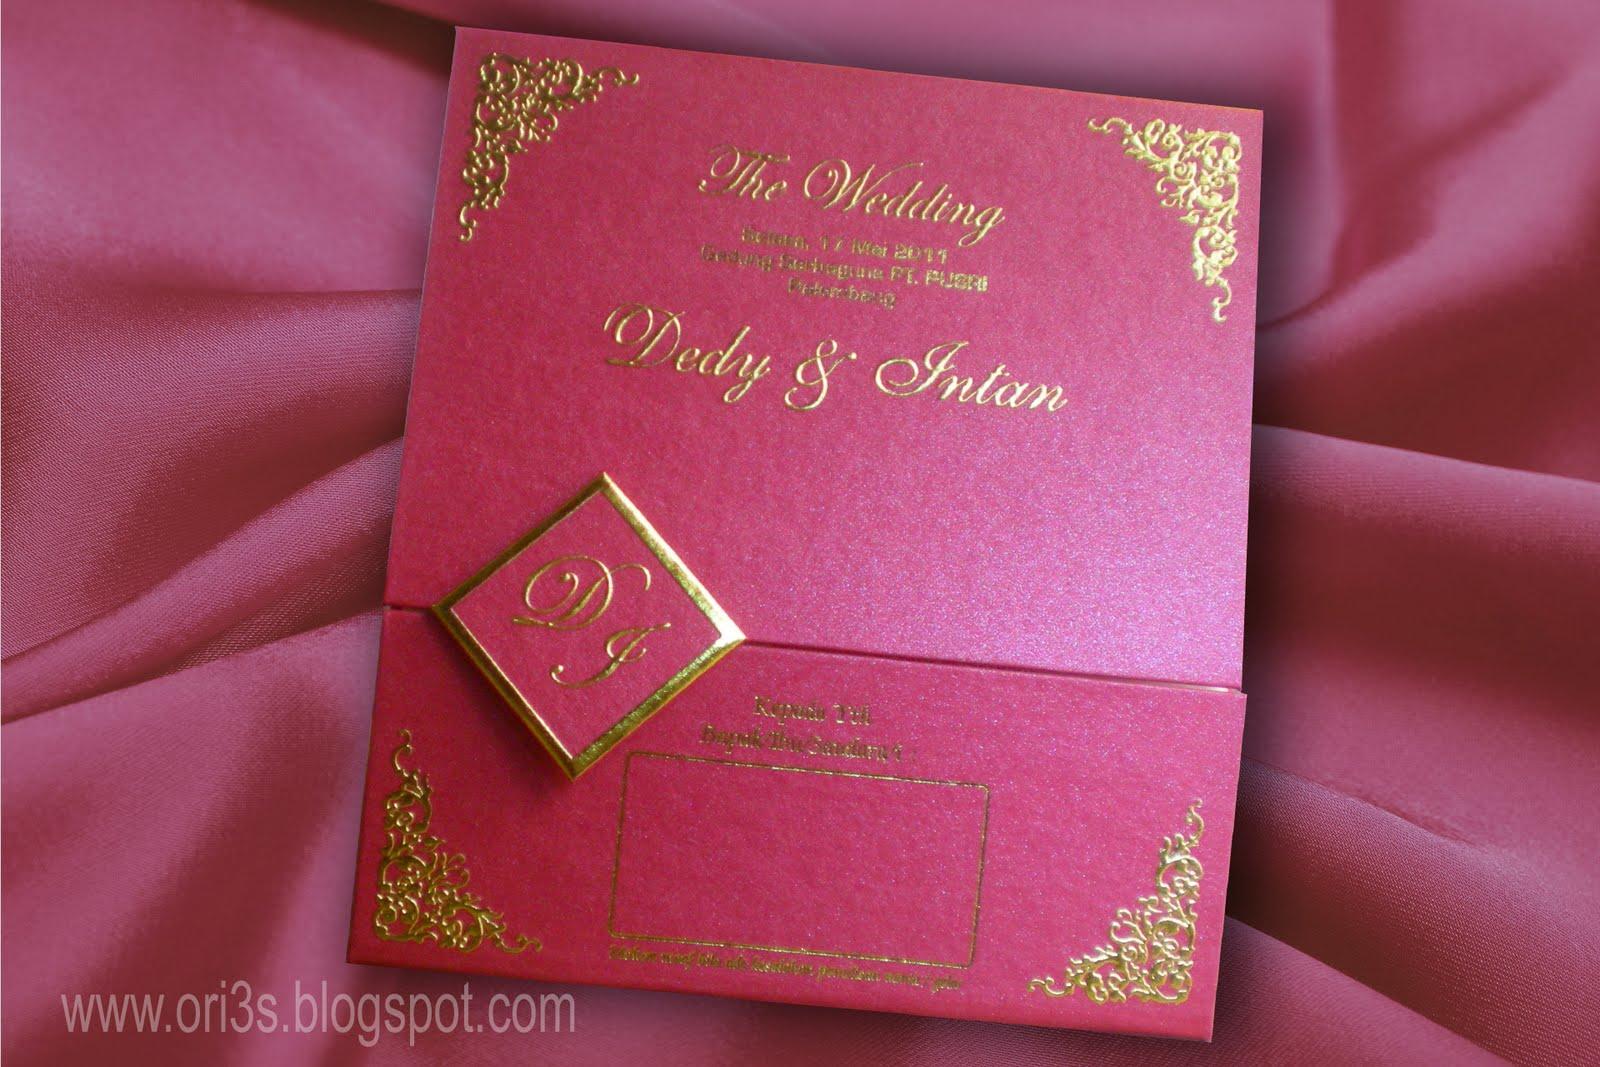 Percetakan ORIE. Kartu Undangan, Wedding Card. Palembang